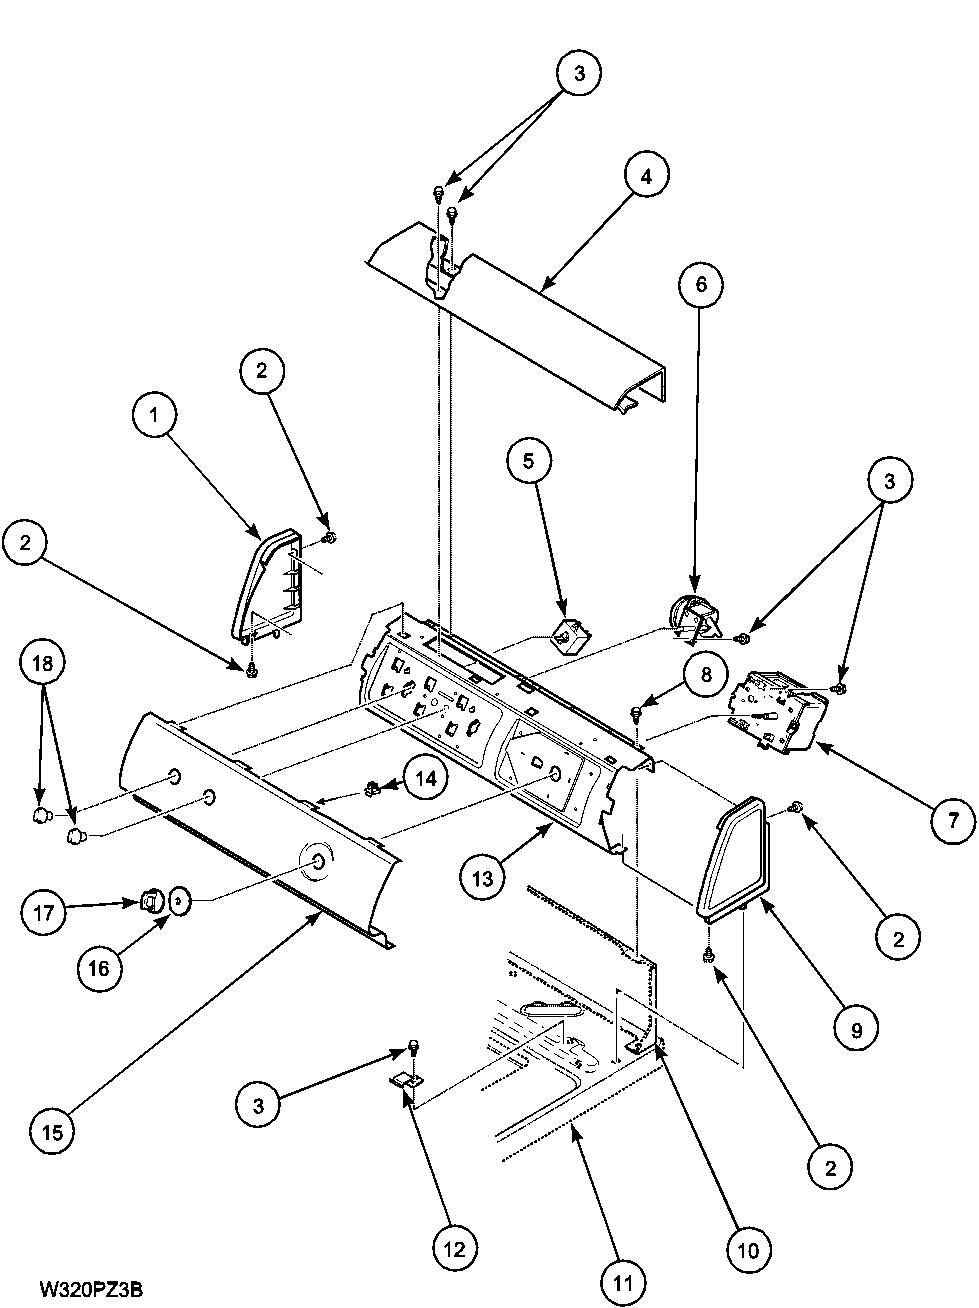 XO_6906] Amana Washing Machine Wiring Diagram Wiring DiagramGresi Skat Salv Mohammedshrine Librar Wiring 101